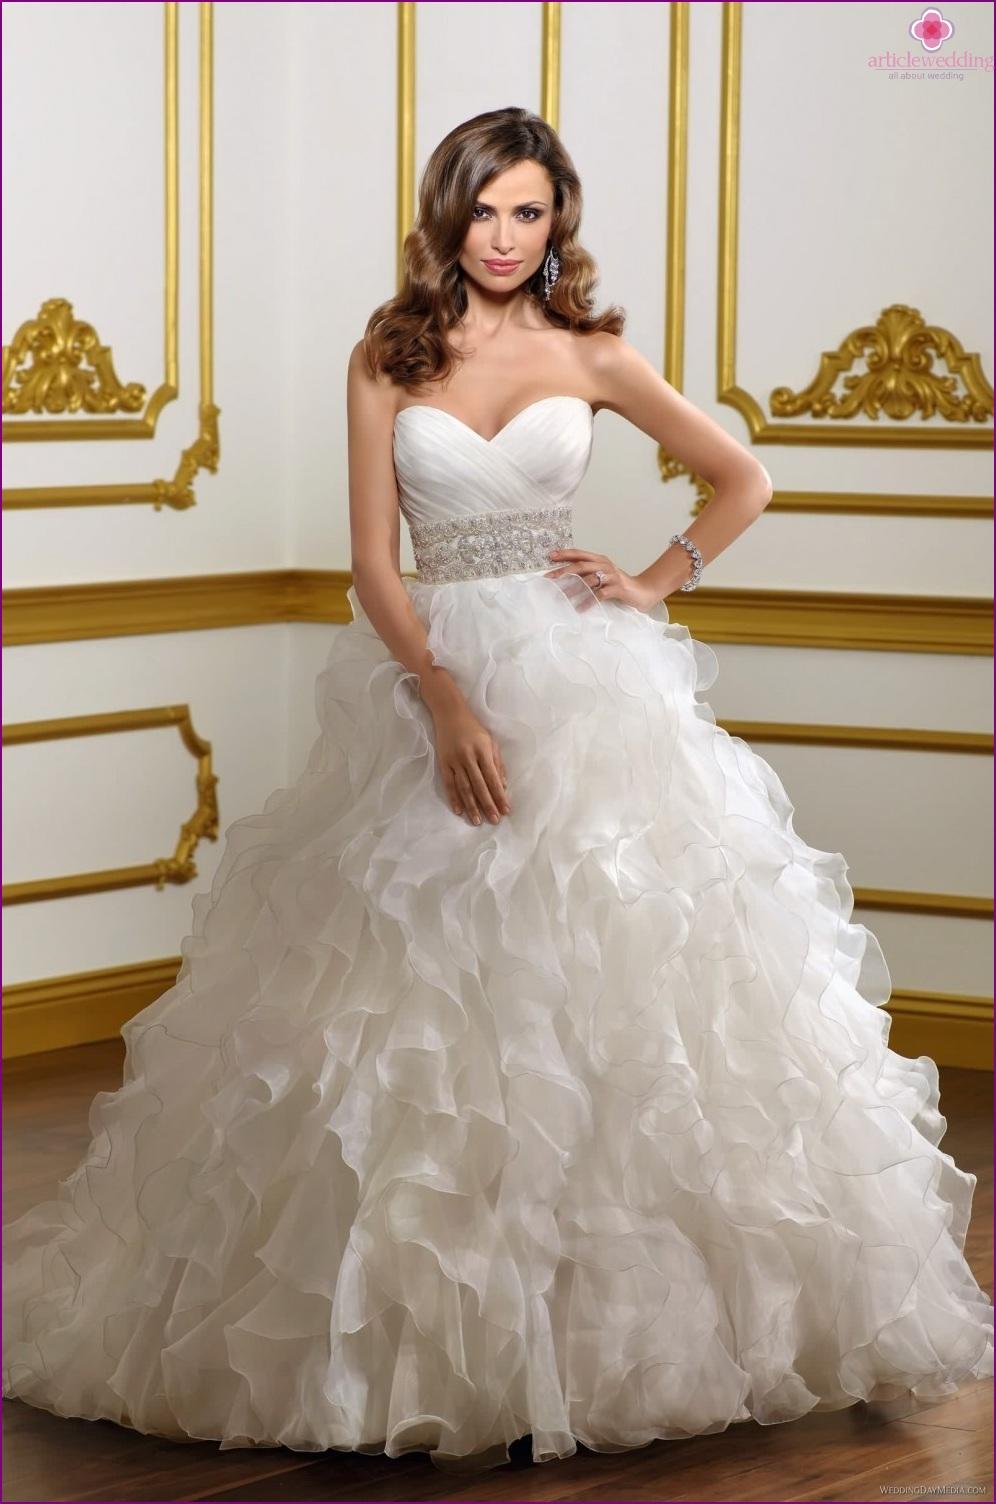 luxury wedding dresses stylish and romantic luxury wedding dresses Magnificent wedding dress